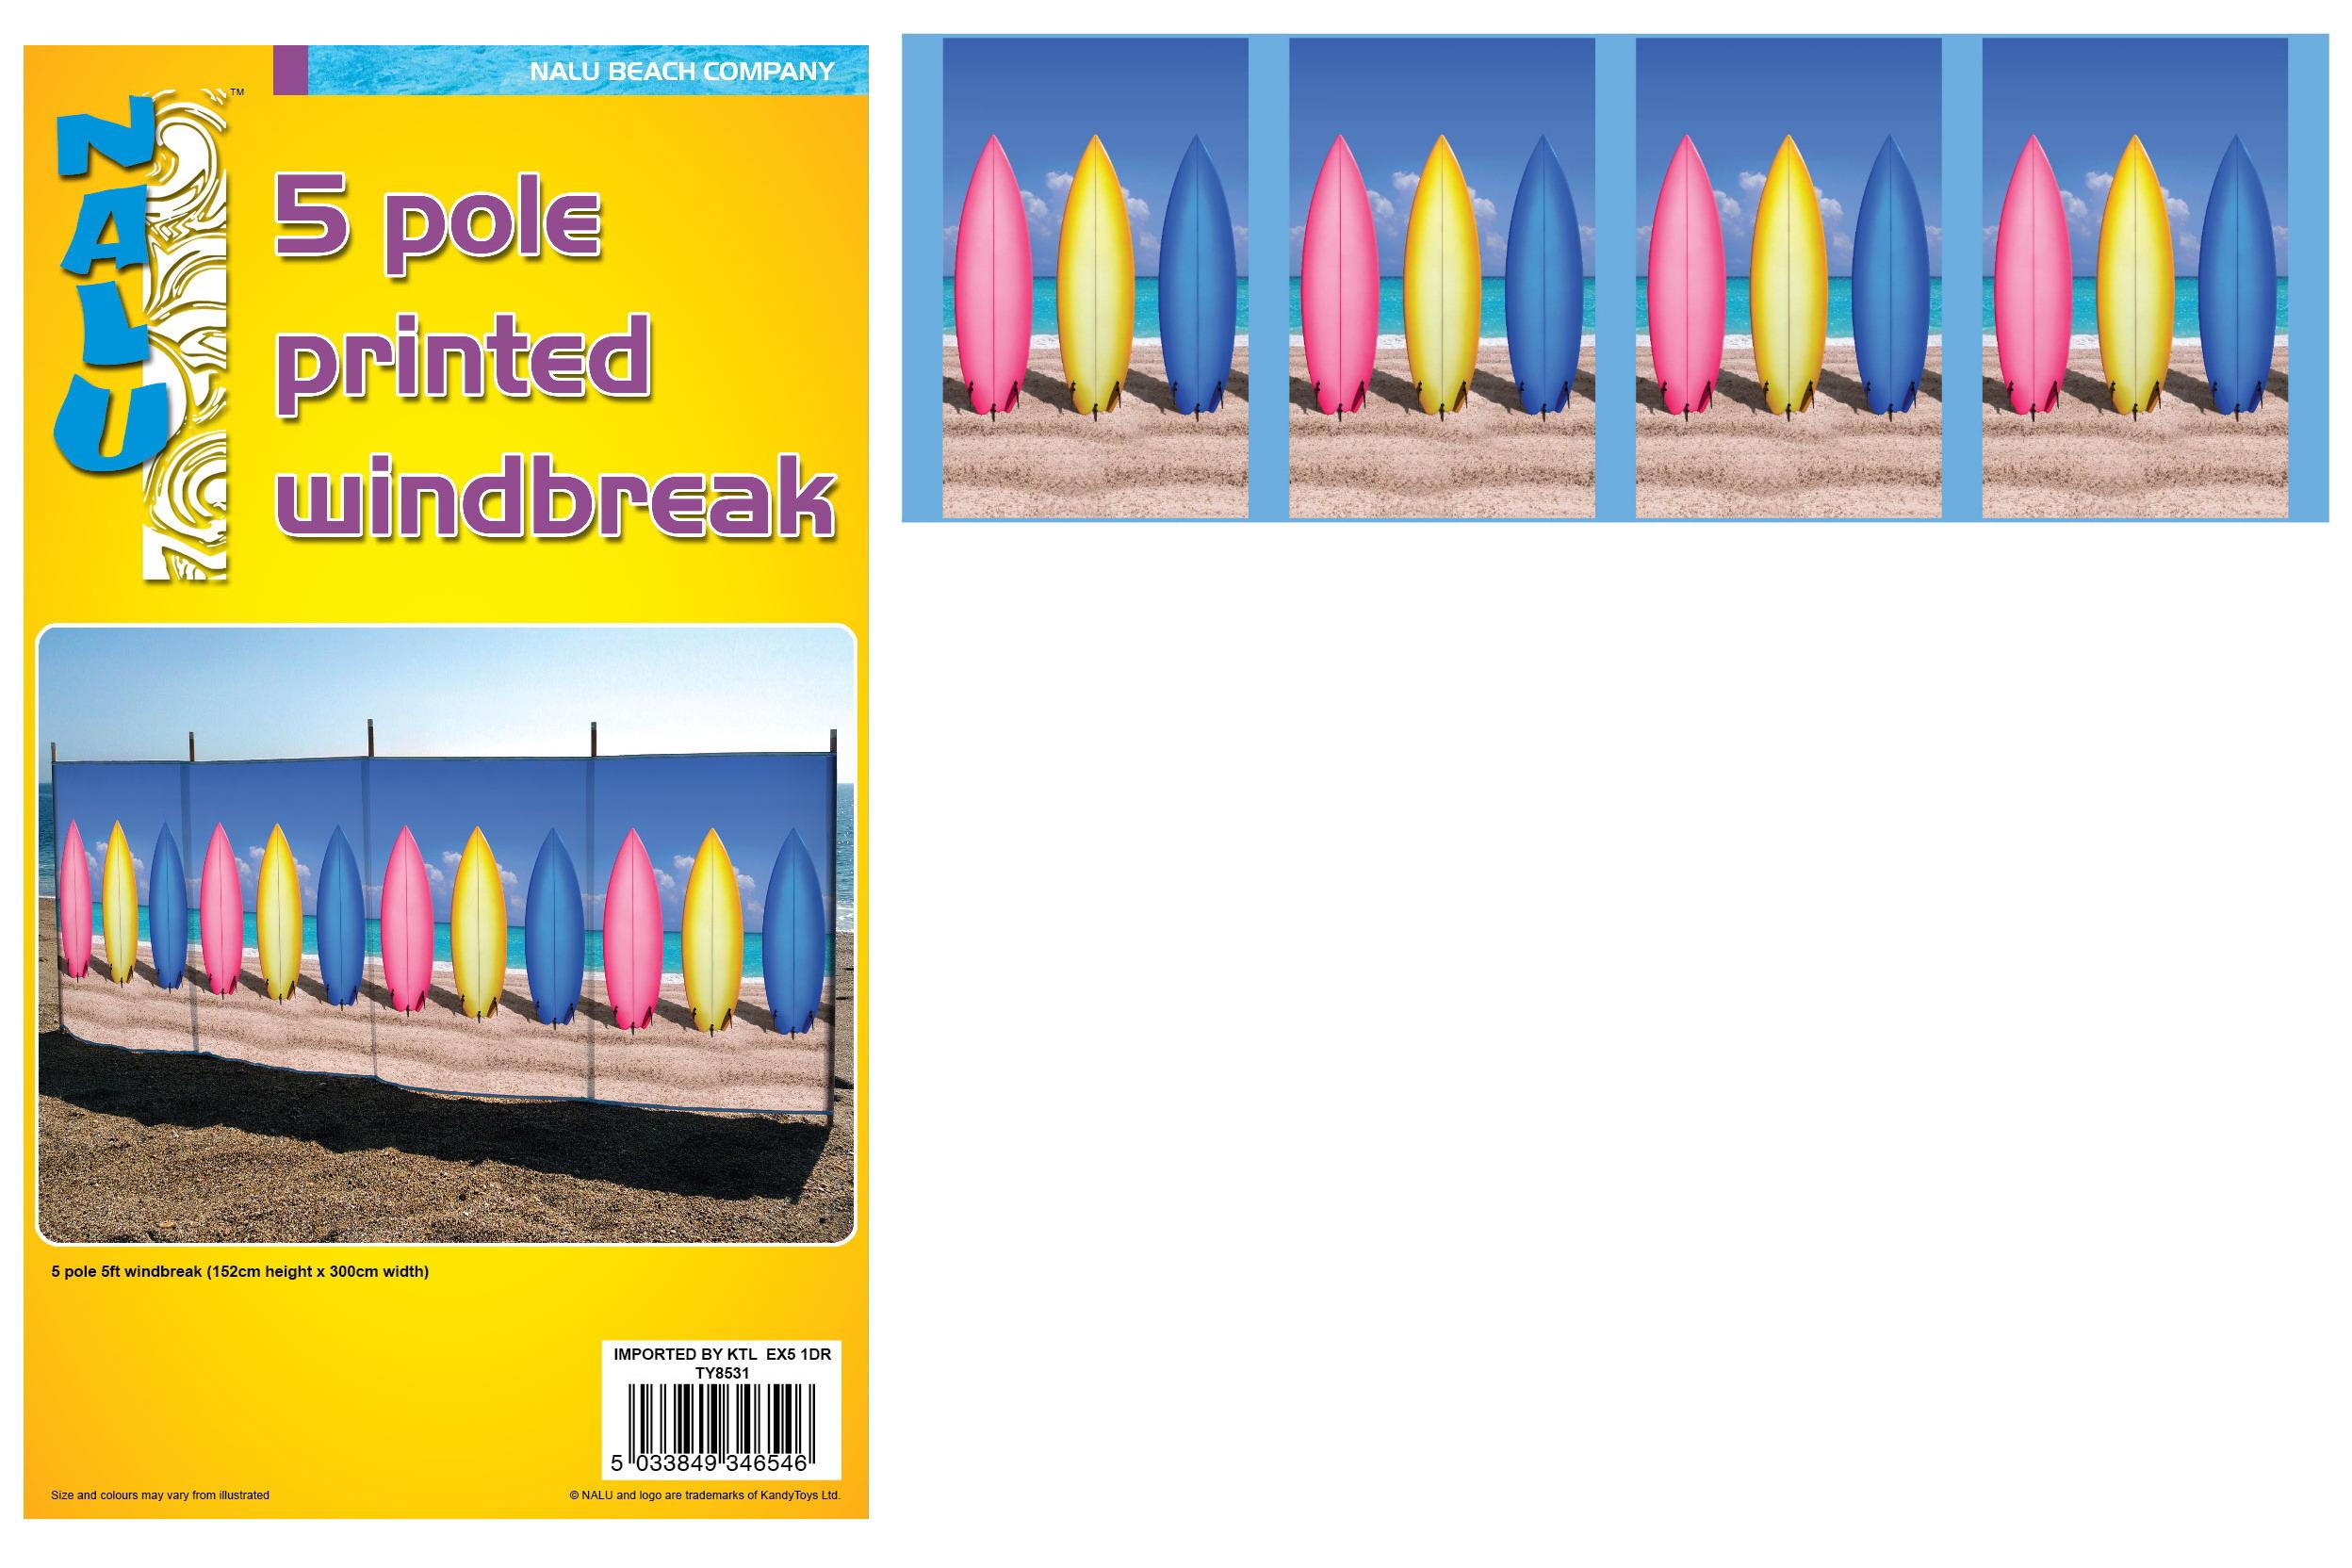 5 Pole 5' Printed Windbreak - Surf Boards Design